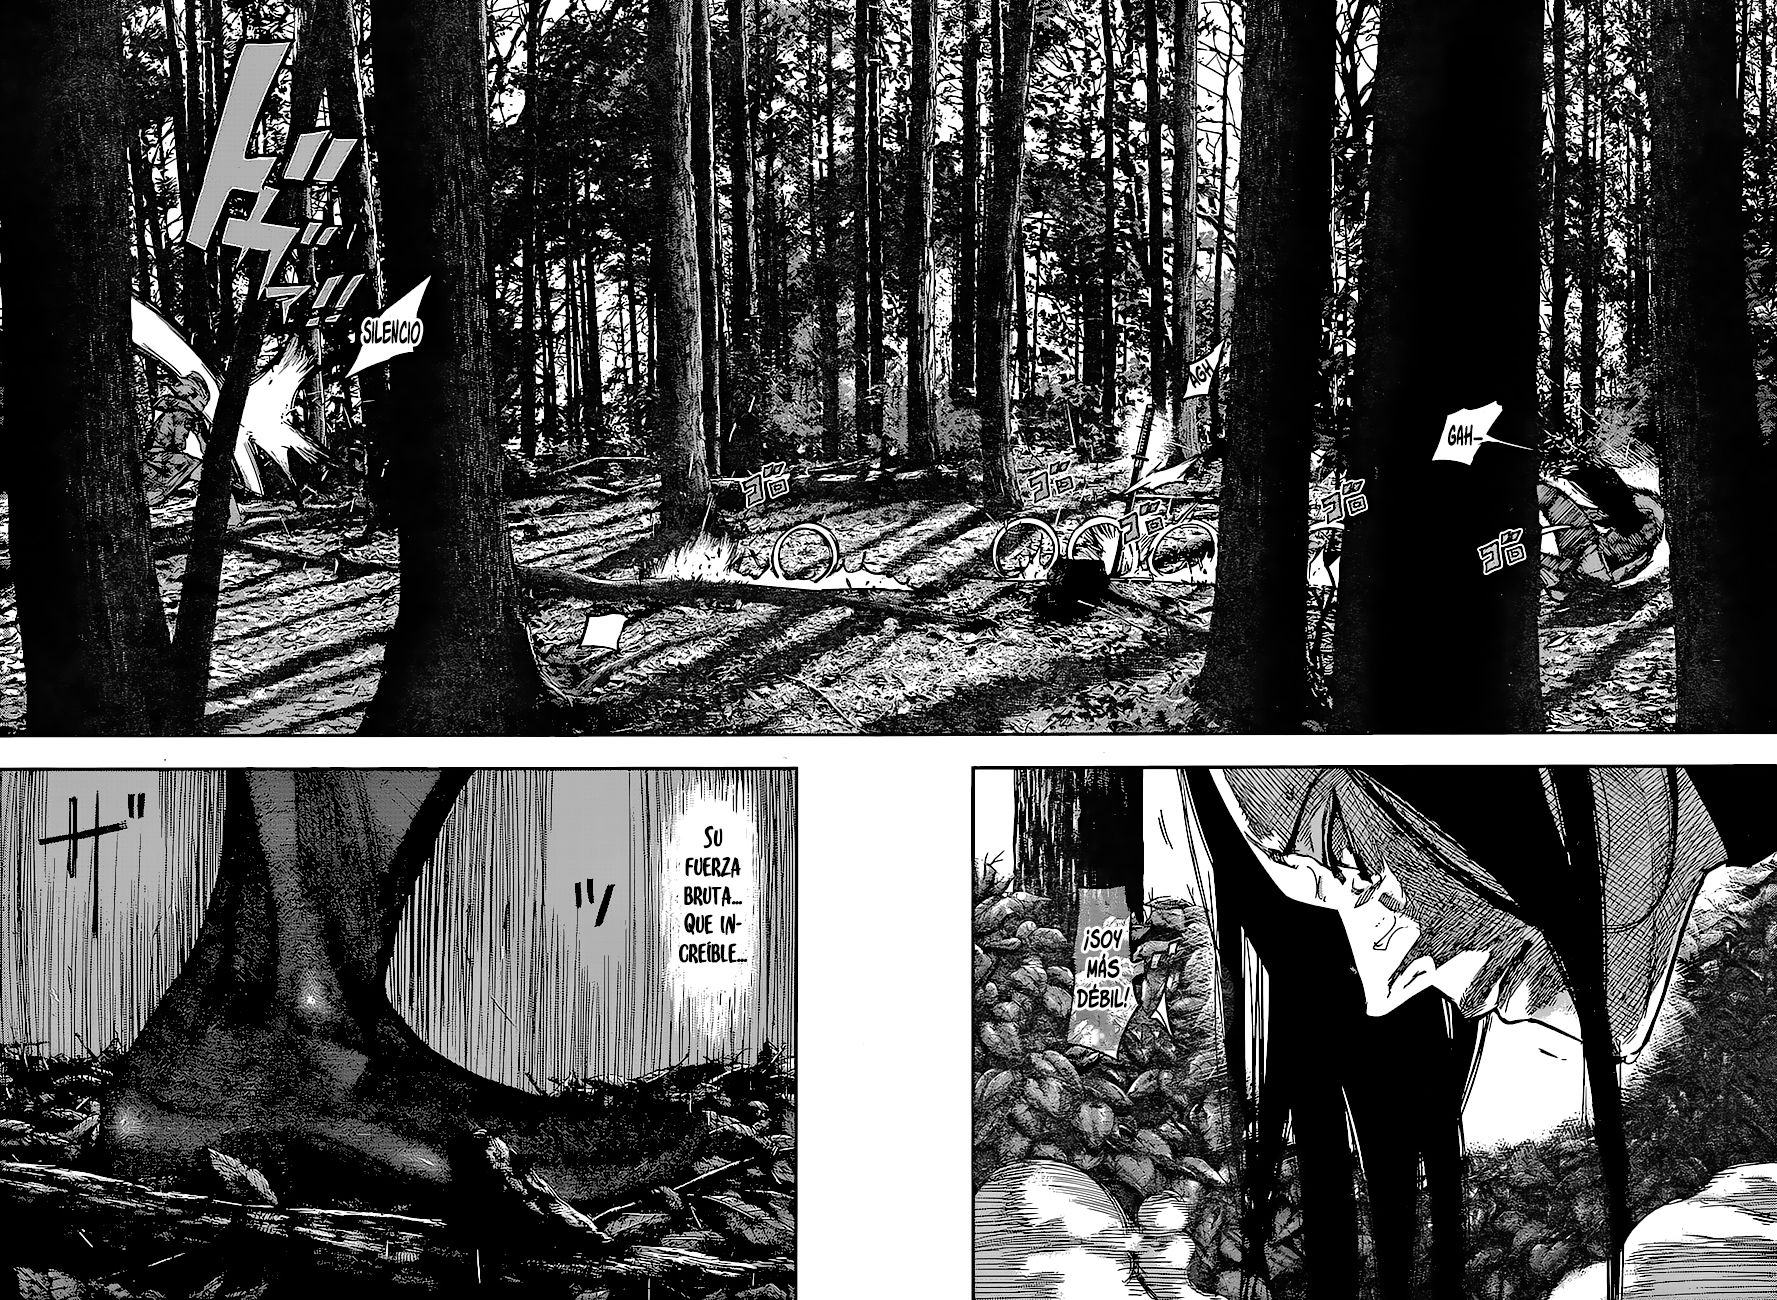 http://c5.ninemanga.com/es_manga/59/59/474649/da94be6d2b80d736e2d13d1e3c47d035.jpg Page 8